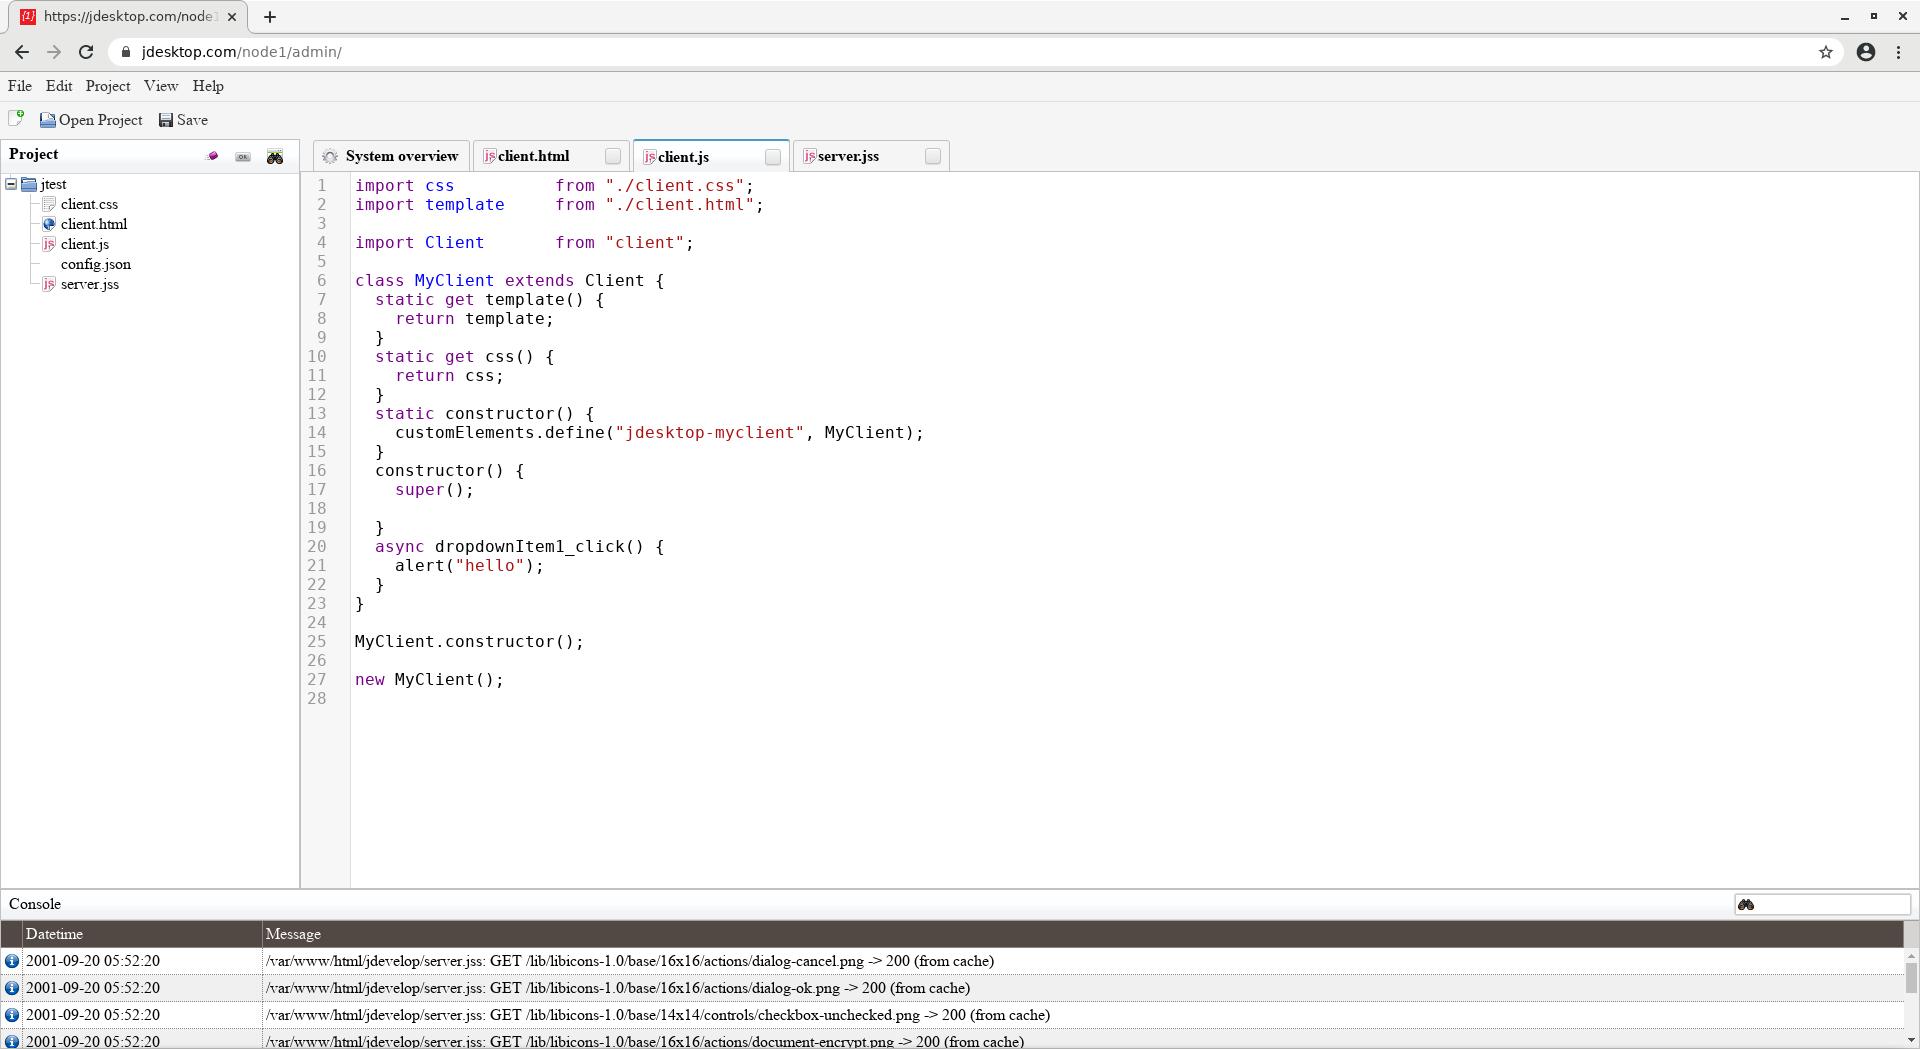 Screenshot_2020-09-20_19-54-23